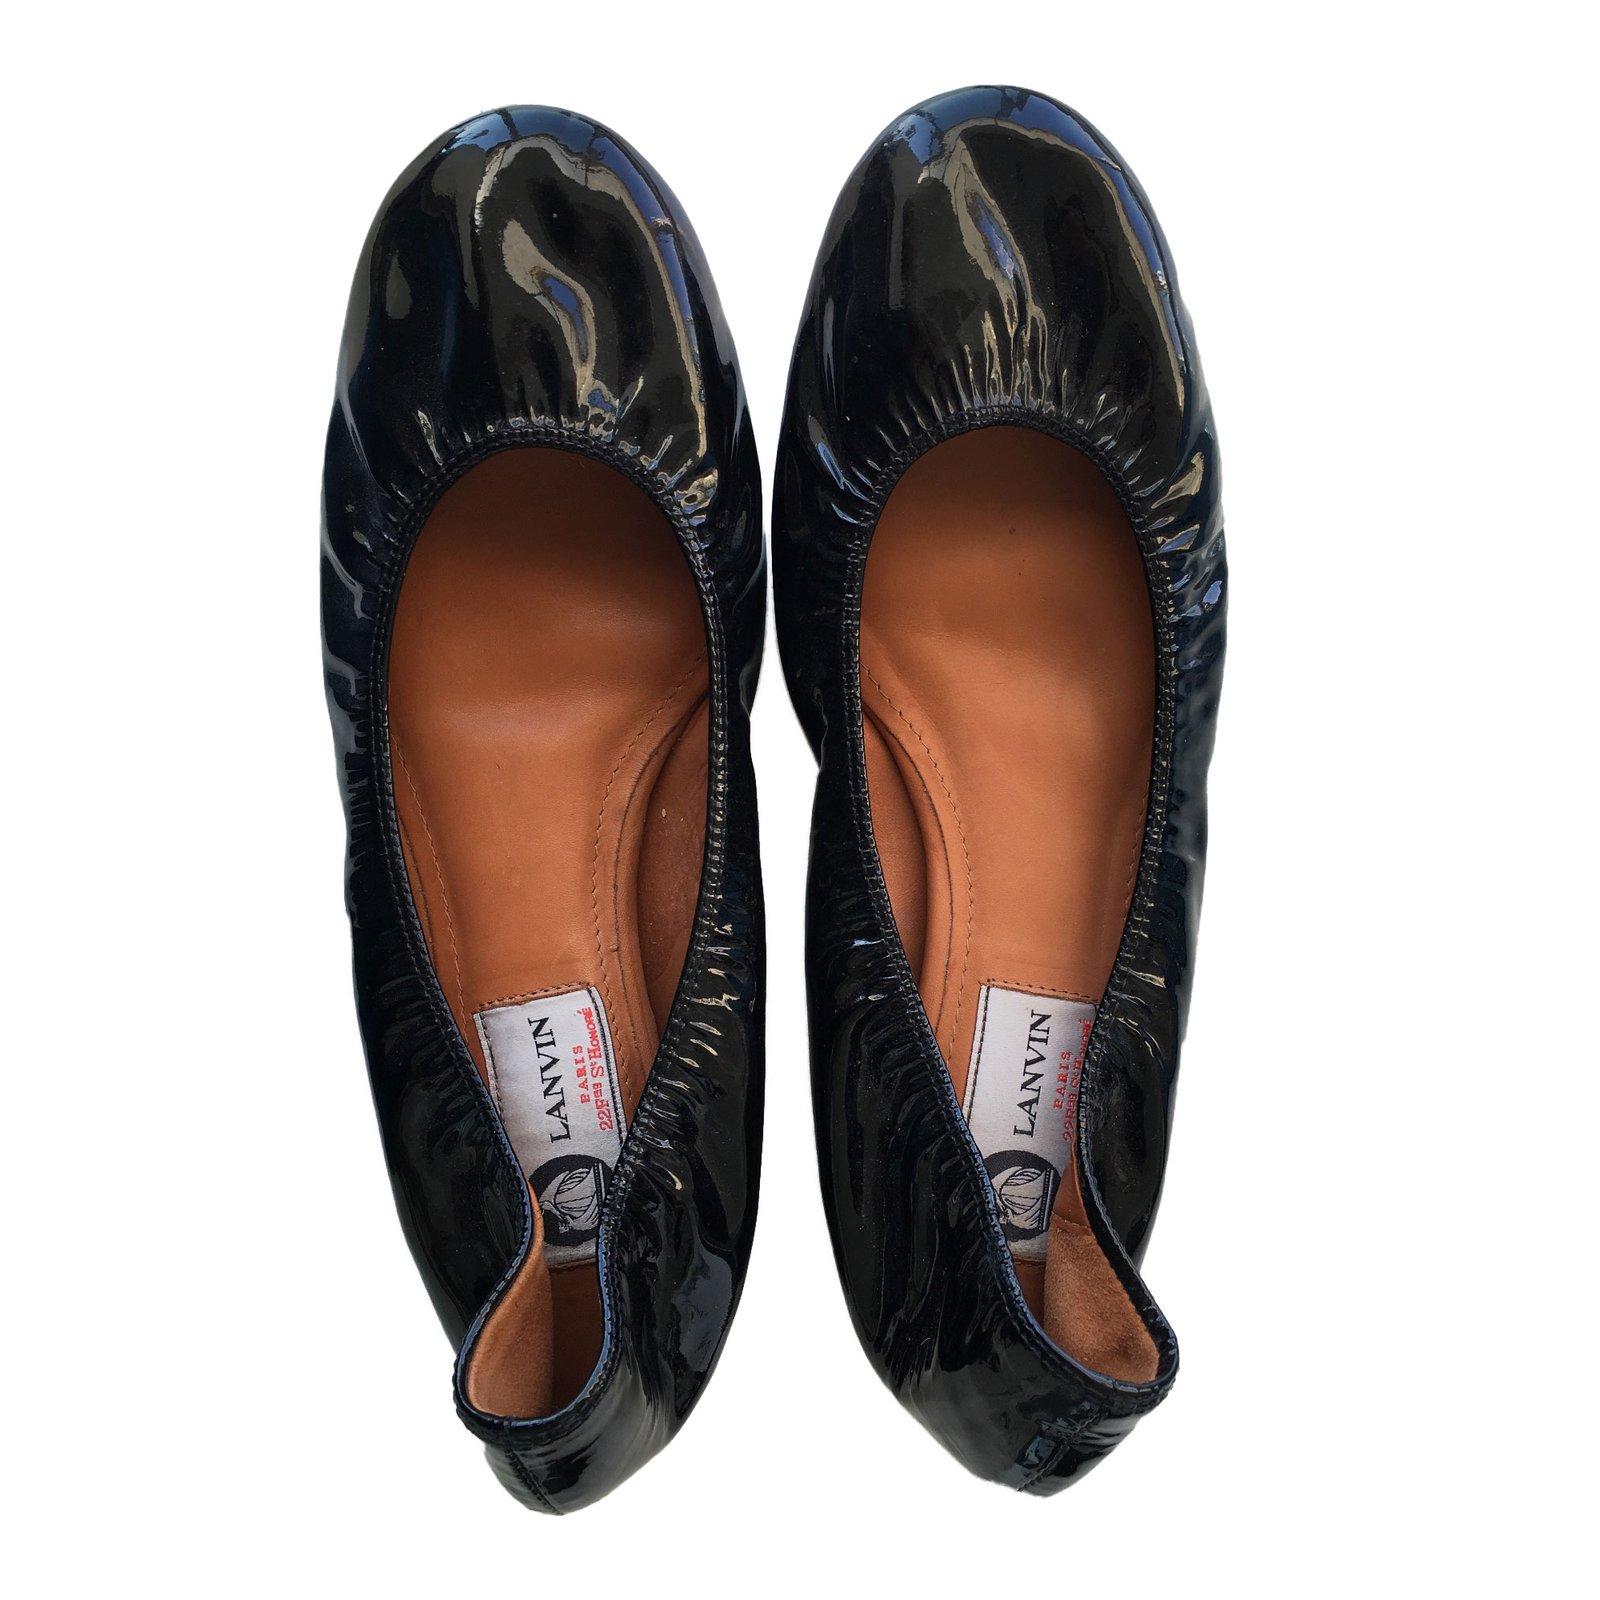 09fbd6b408800 Lanvin Ballet flats Ballet flats Patent leather Silvery ref.39217 ...